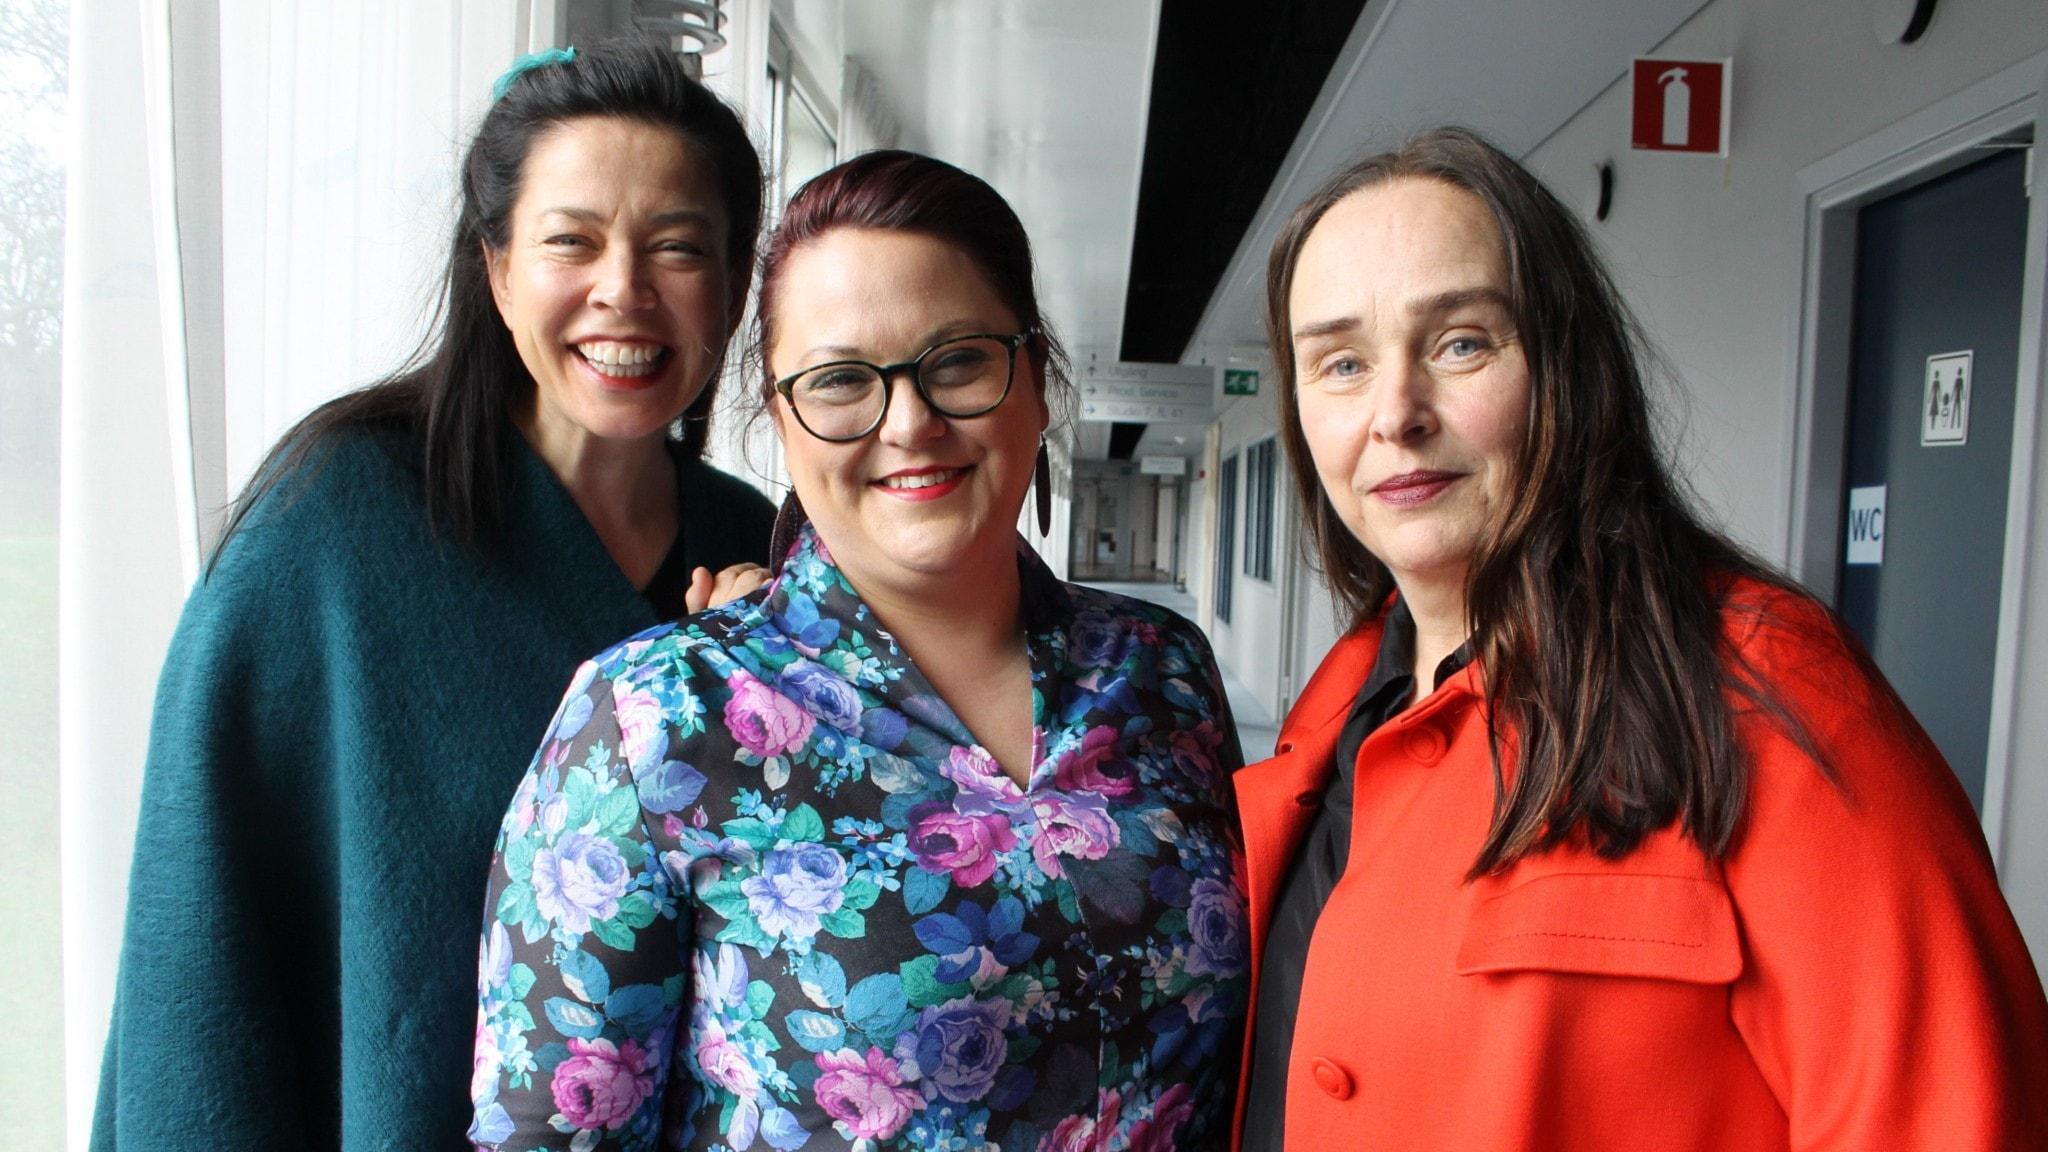 Marie Lundström, Malin Haawind och Estrid Hiolm.